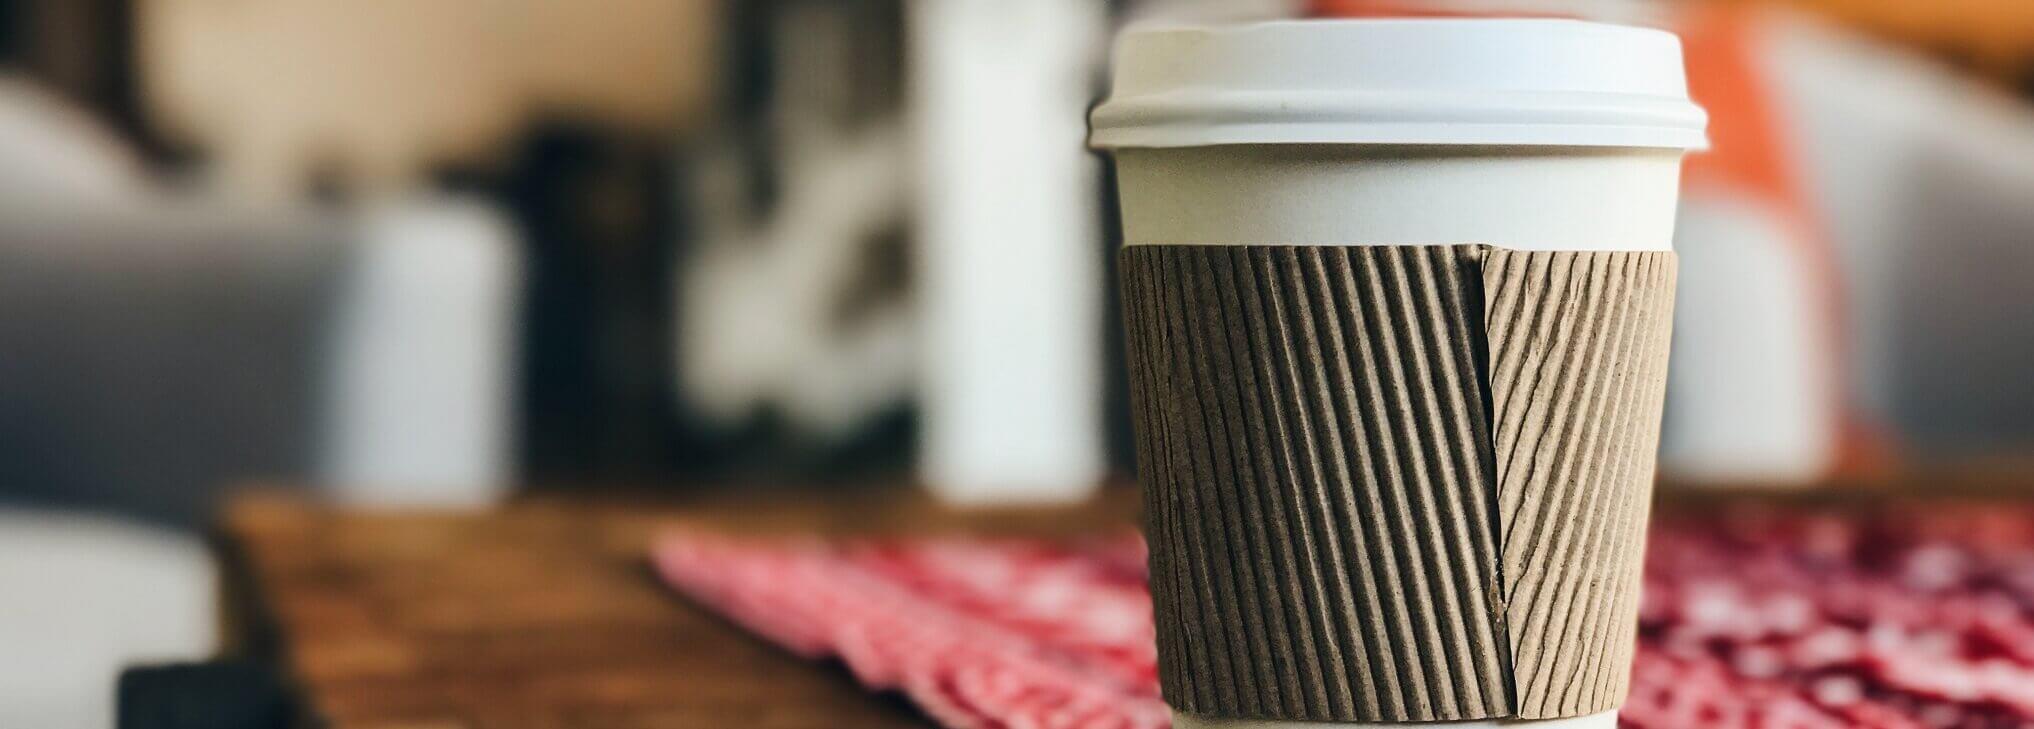 Plastic Disposable Cups